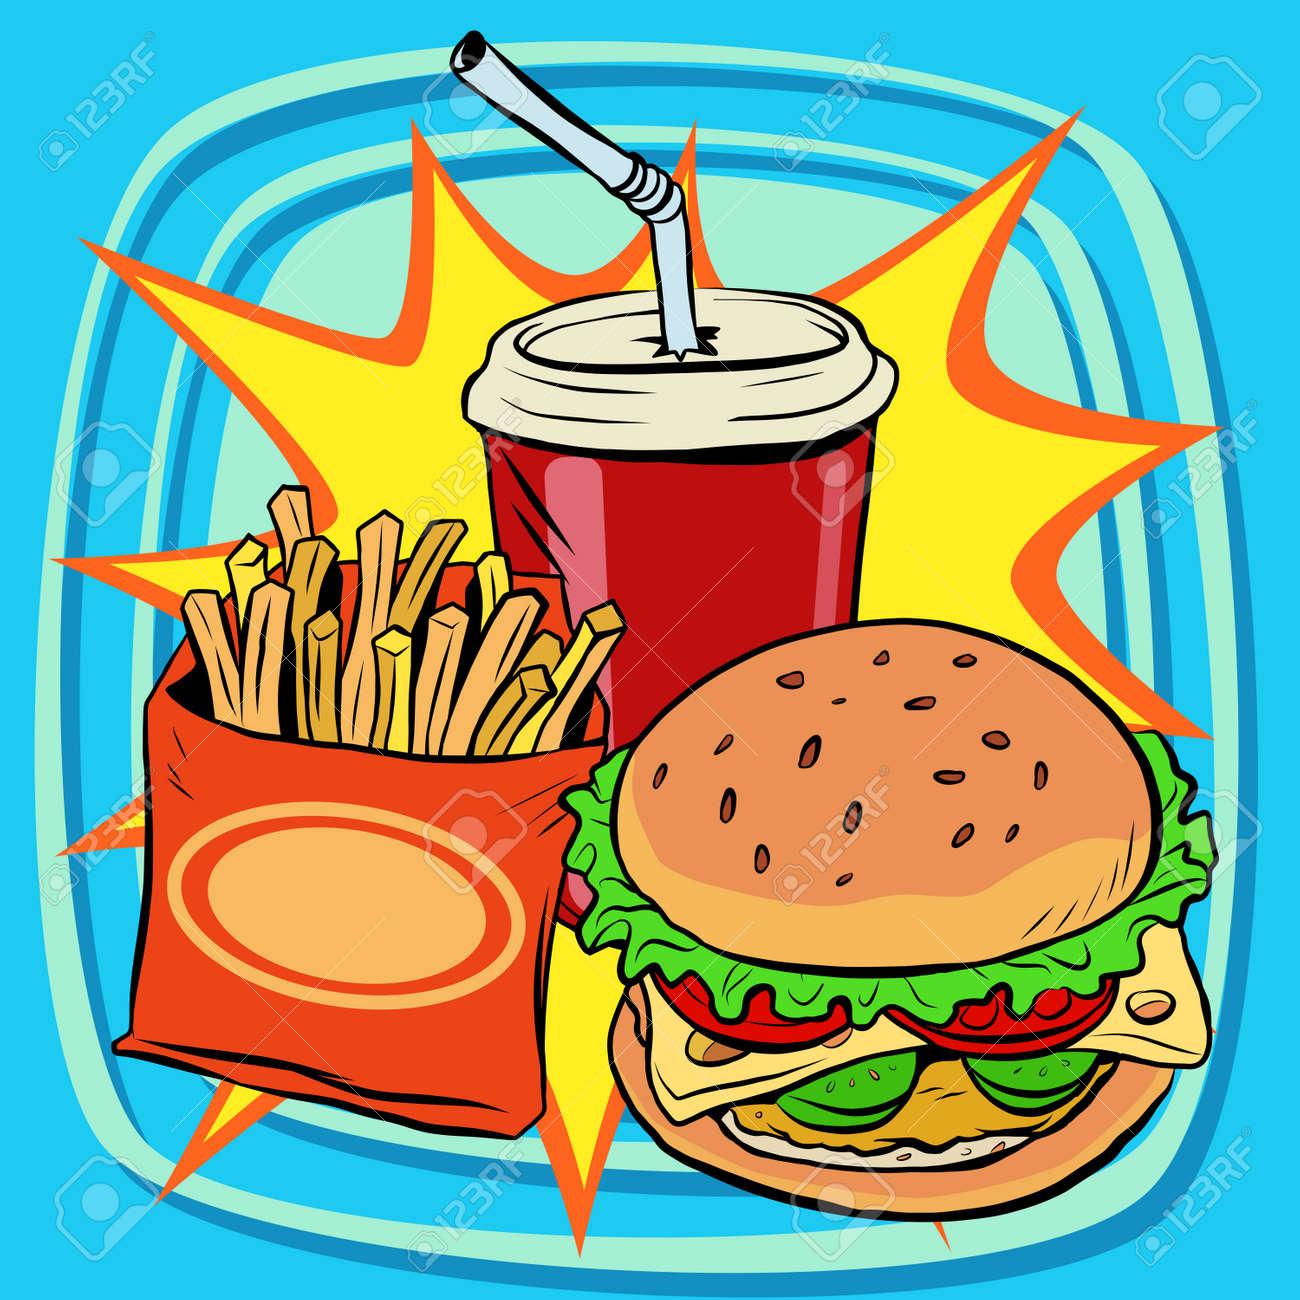 fast food fries burger drink cola pop art retro vector. Street restaurant. Nourishing food. Retro food - 55354159